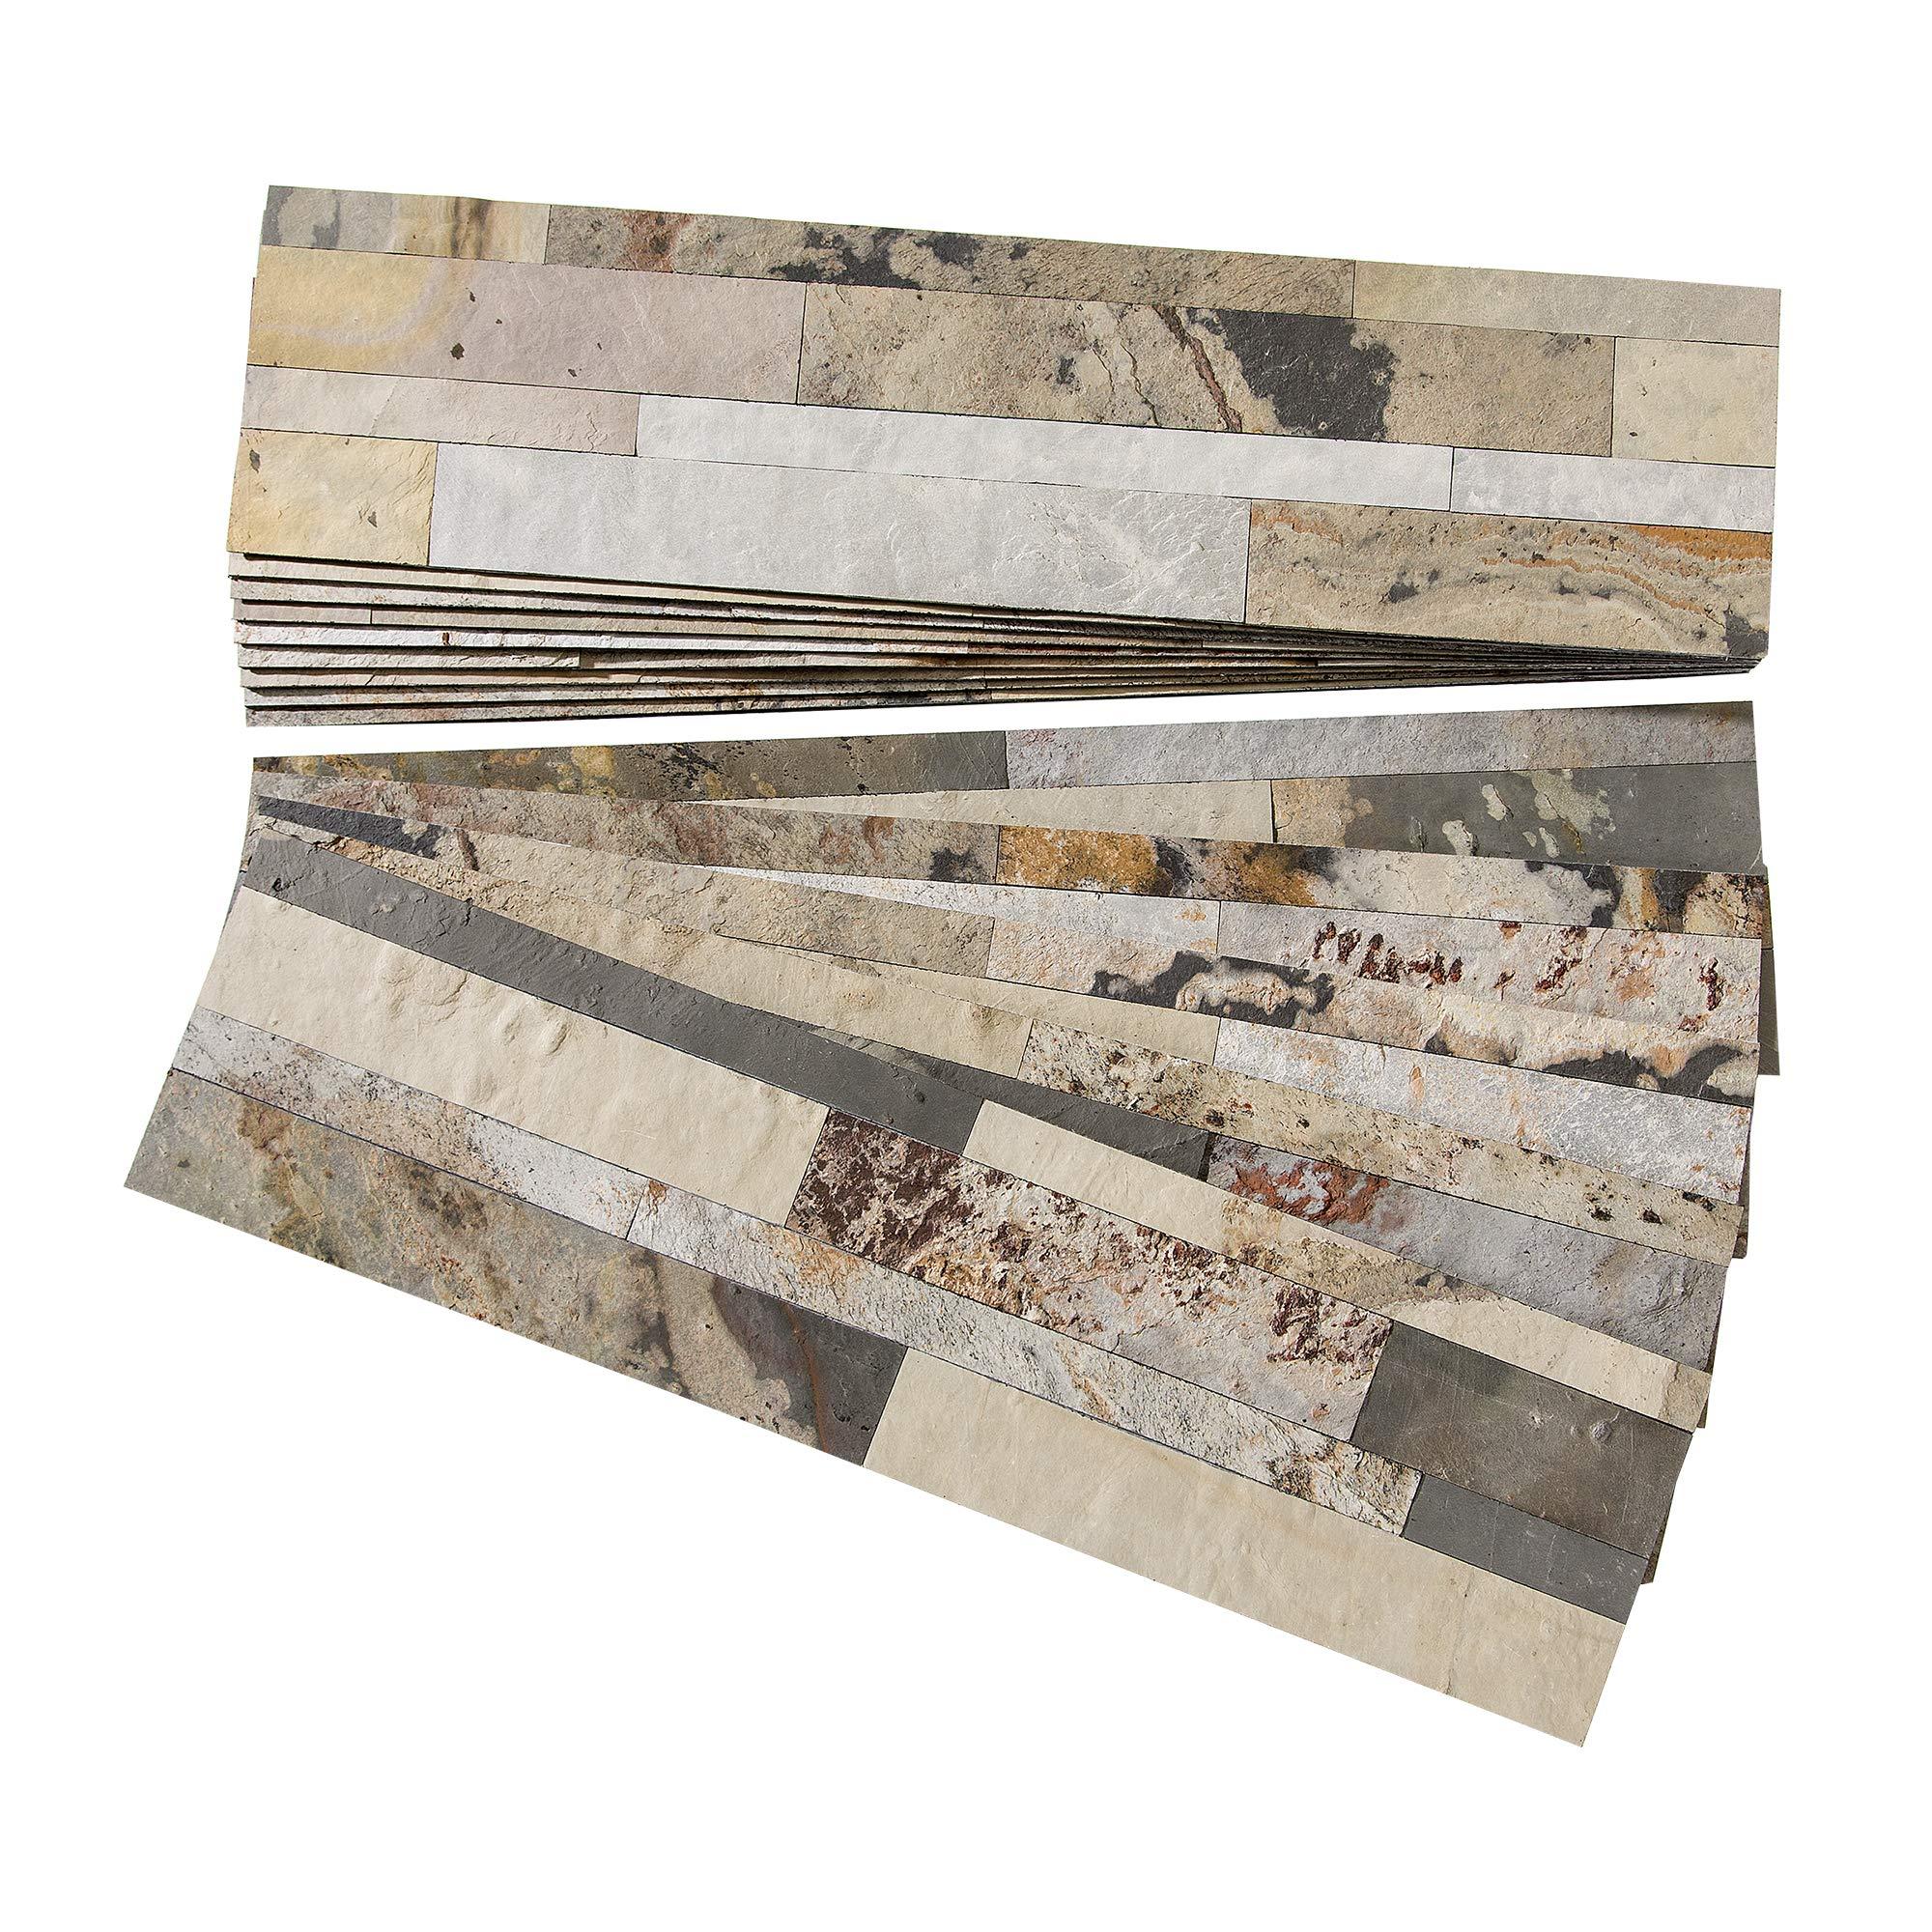 Aspect Peel and Stick Stone Overlay Kitchen Backsplash - Medley Slate (Approx. 15 sq ft Kit) - Easy DIY Tile Backsplash by Aspect